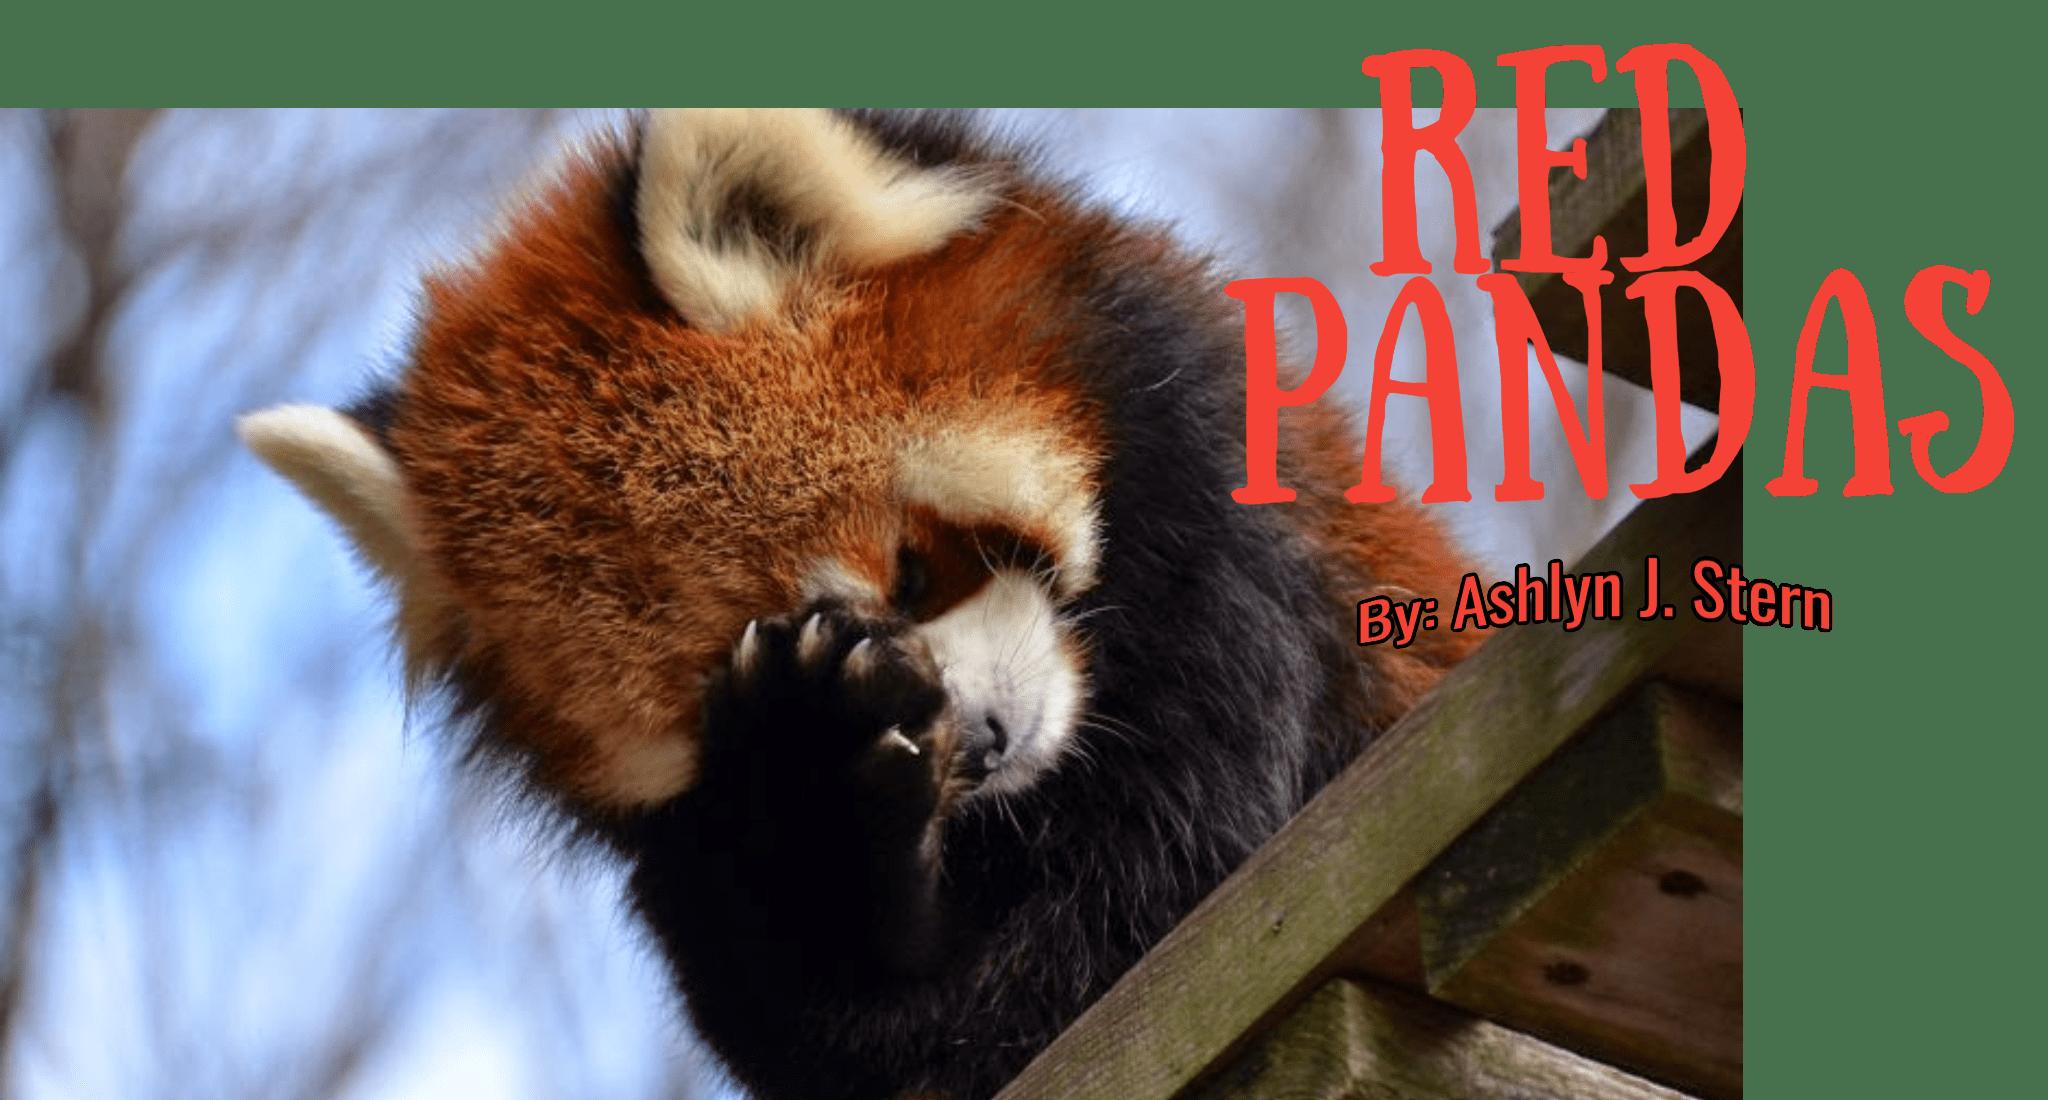 Red Panda Panda Cute Image Customize Download It For Free